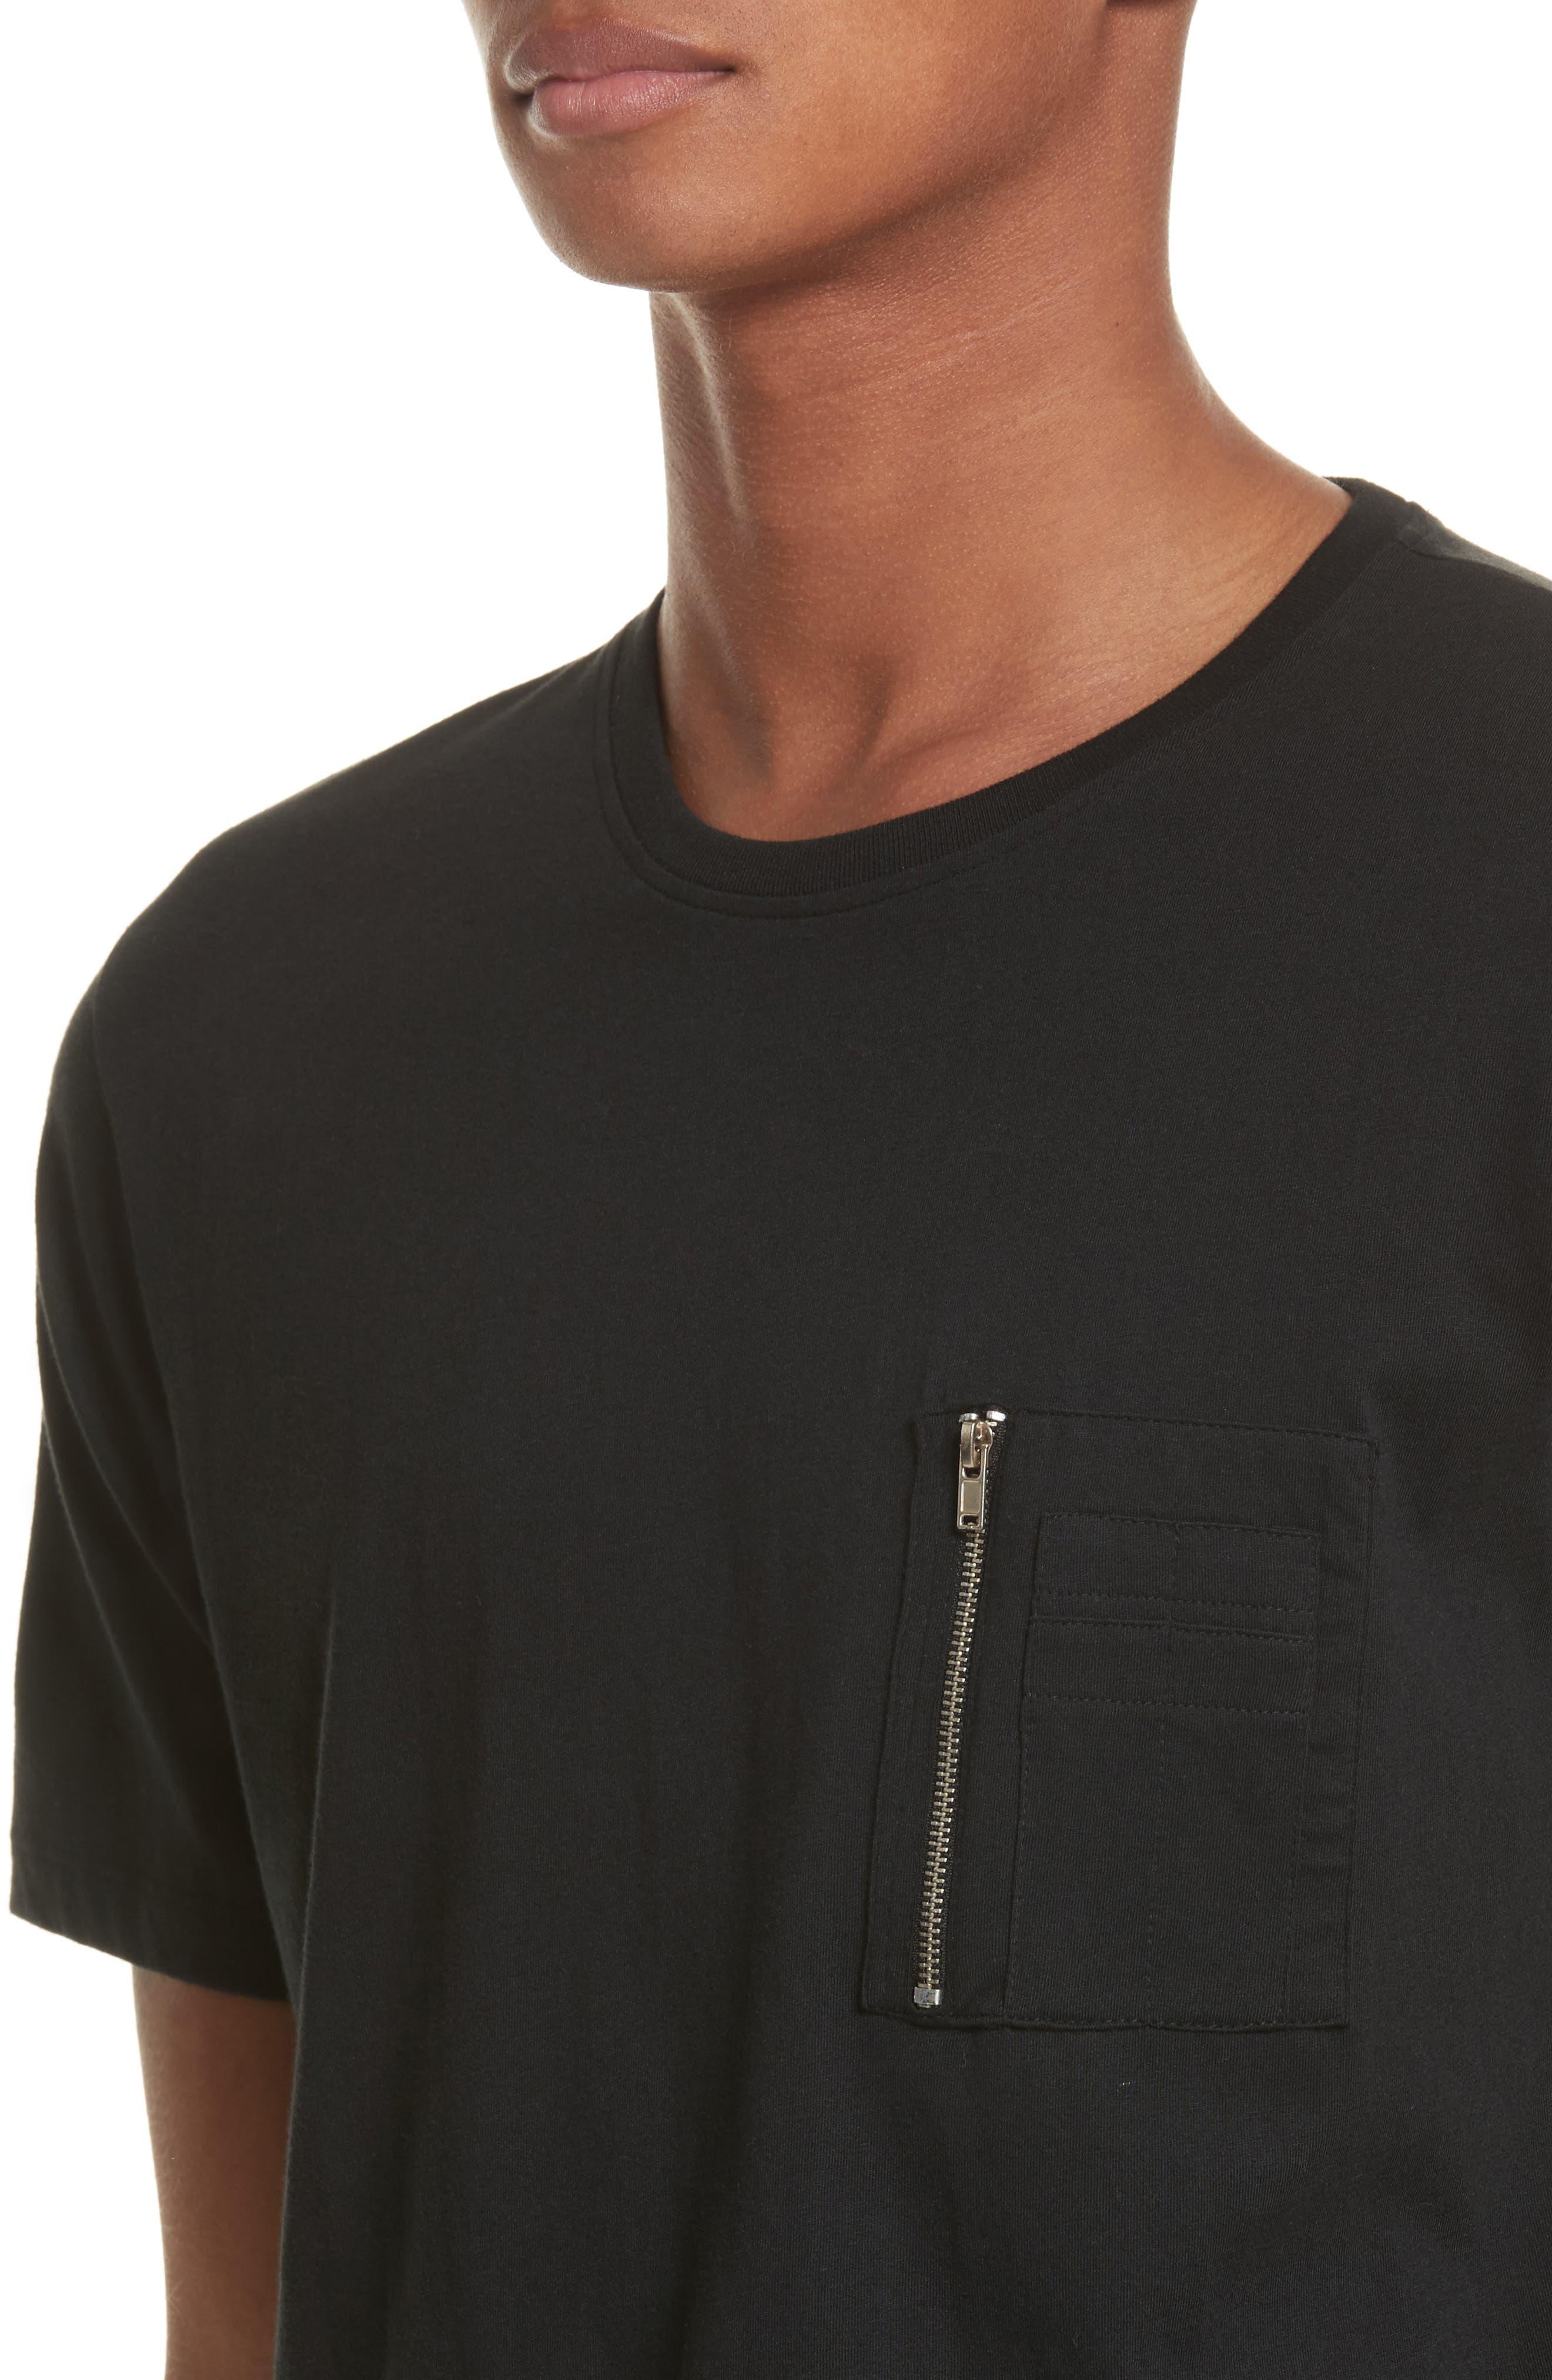 Zip Pocket T-Shirt,                             Alternate thumbnail 4, color,                             001